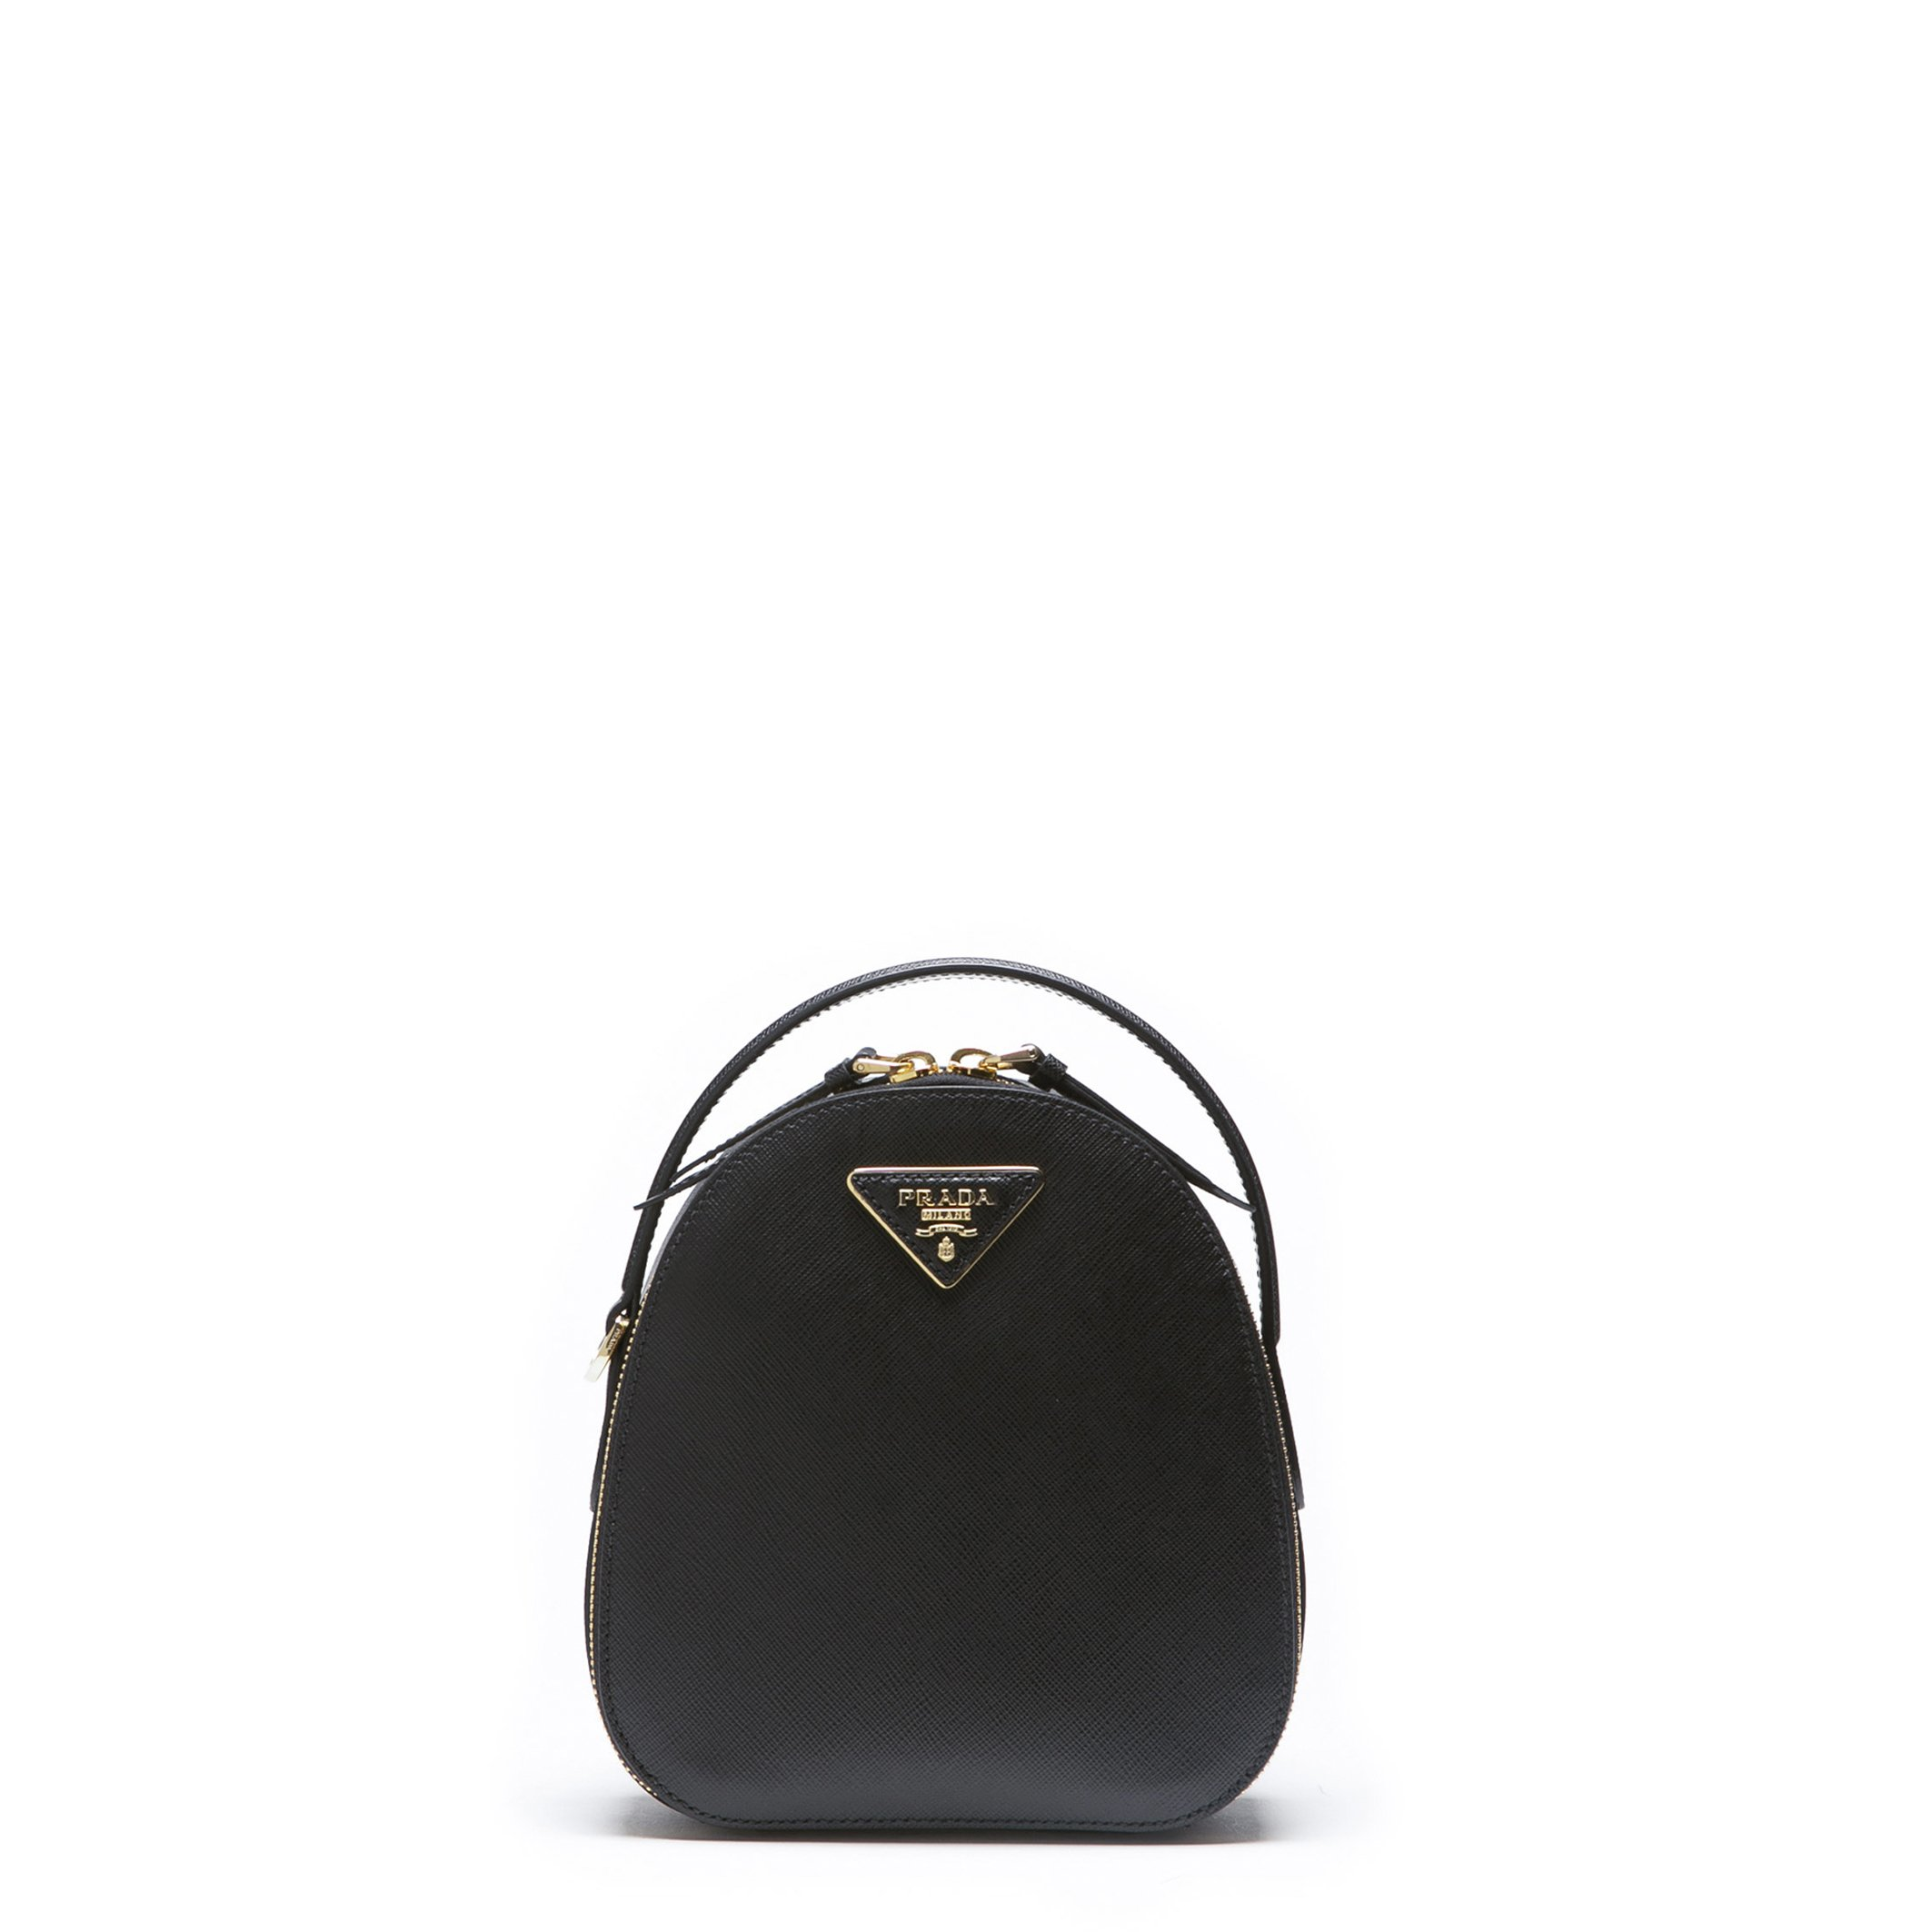 Prada Women's Backpack Various Colours 1BZ047_SAFFIANO - black NOSIZE